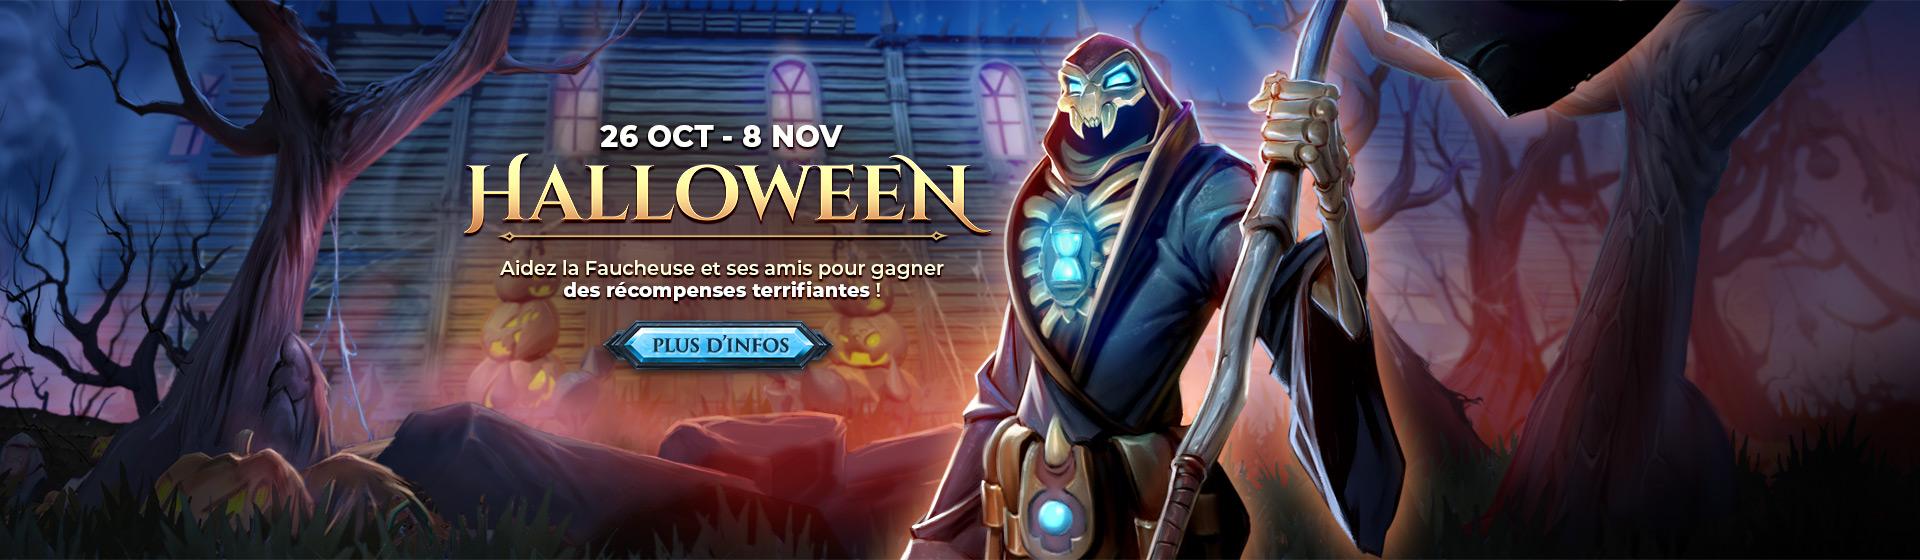 Bannière-Halloween-FR